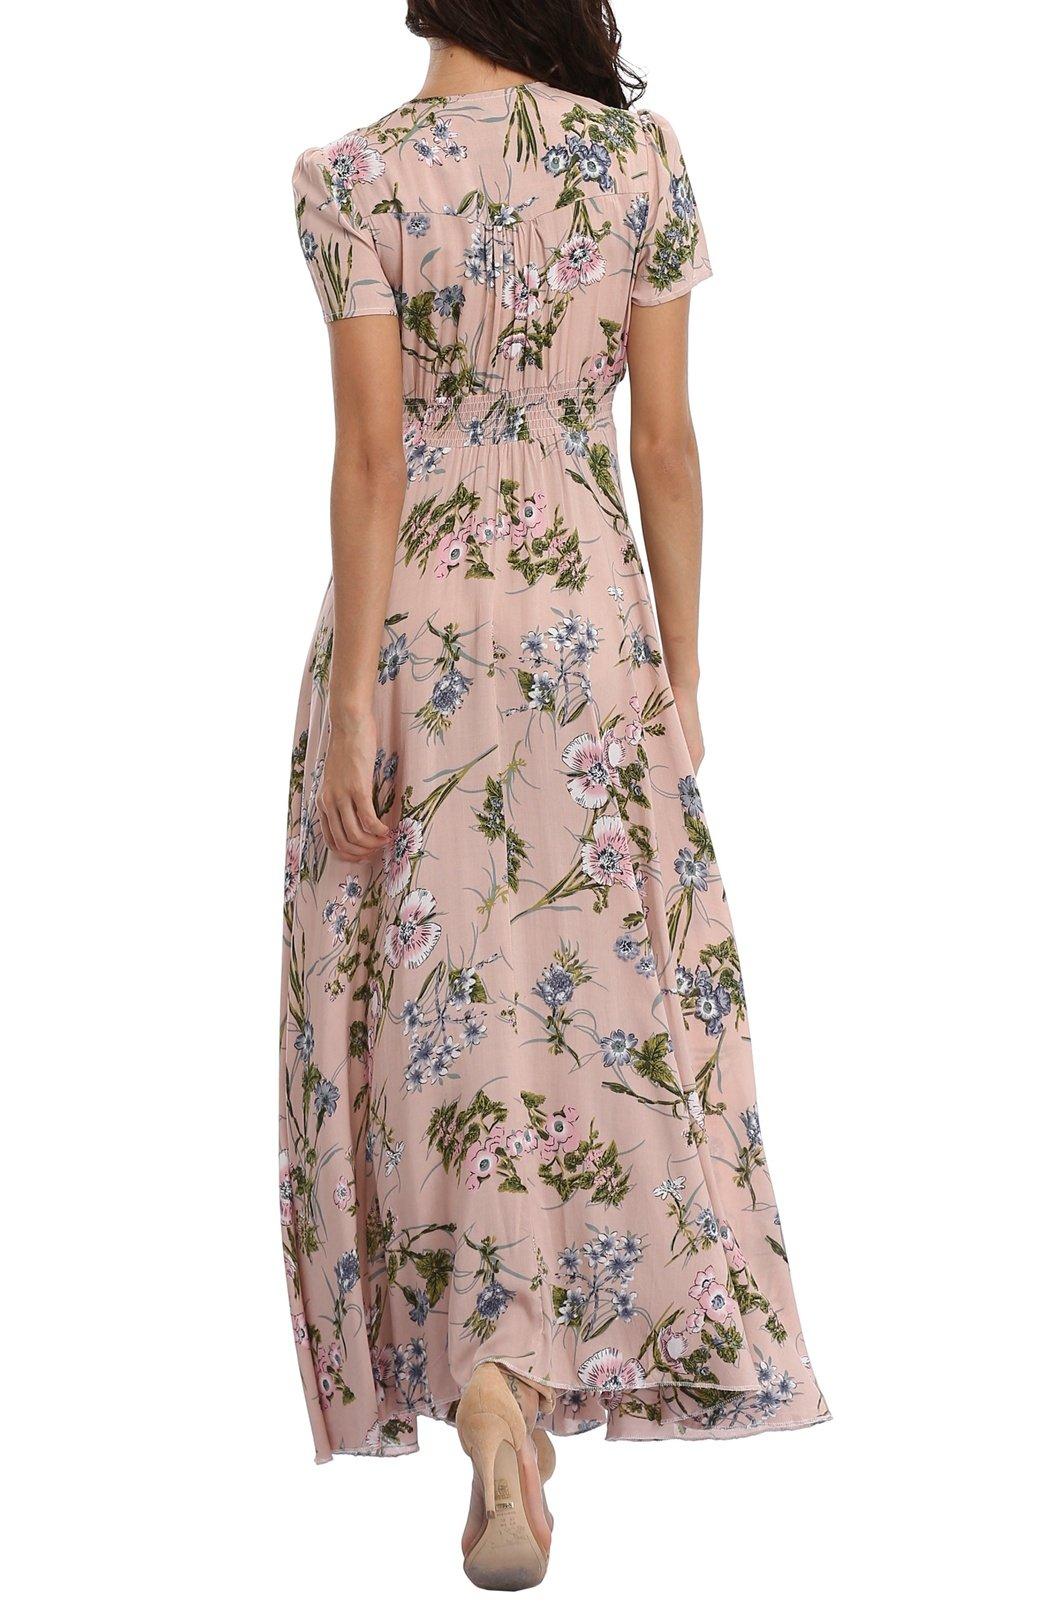 VintageClothing Women's Floral Print Maxi Dresses Boho Button Up Split Beach Party Dress,Pale Dogwood,Large by VintageClothing (Image #4)